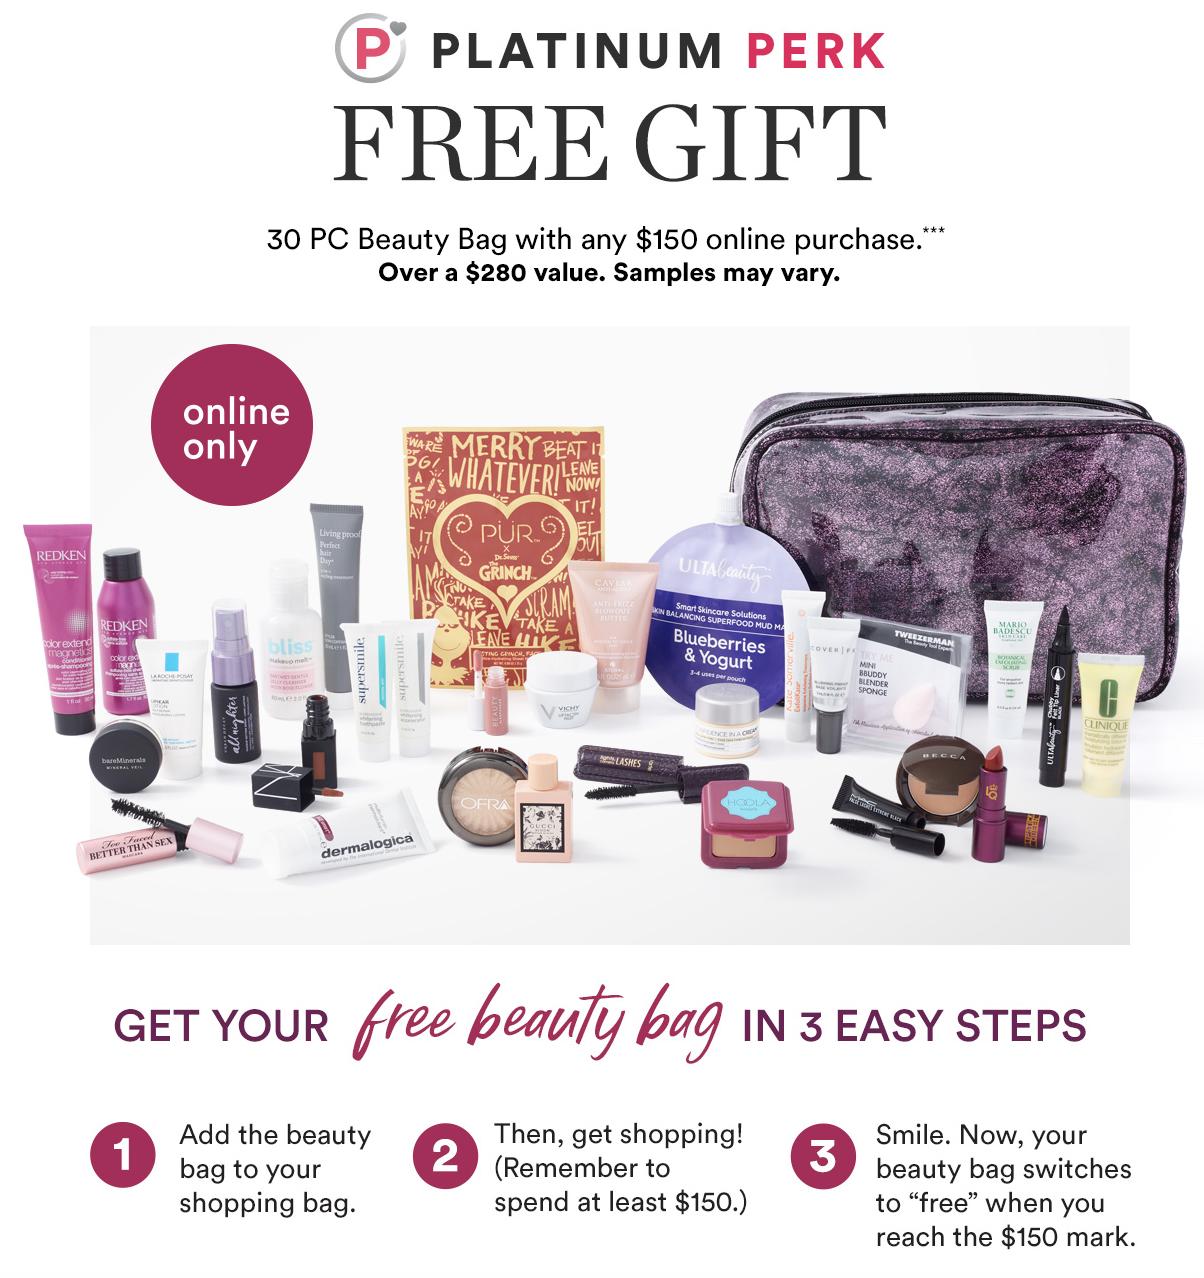 Ulta FREE 5 pcs DevaCurl Gift w/40 haircare purchase